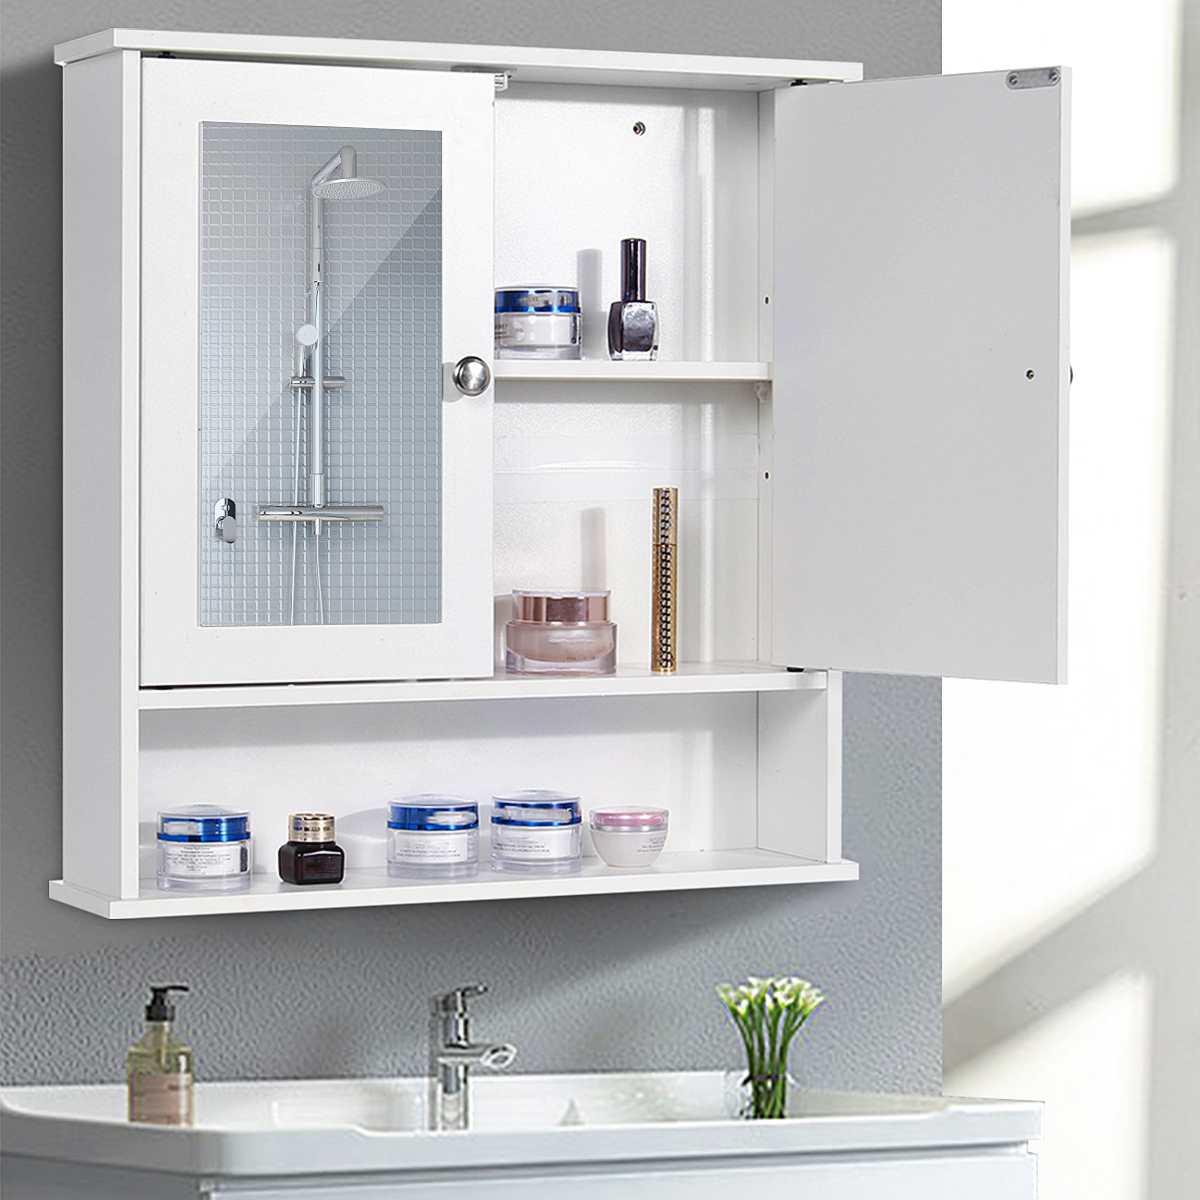 X 13cm Bathroom Cabinet With Mirror